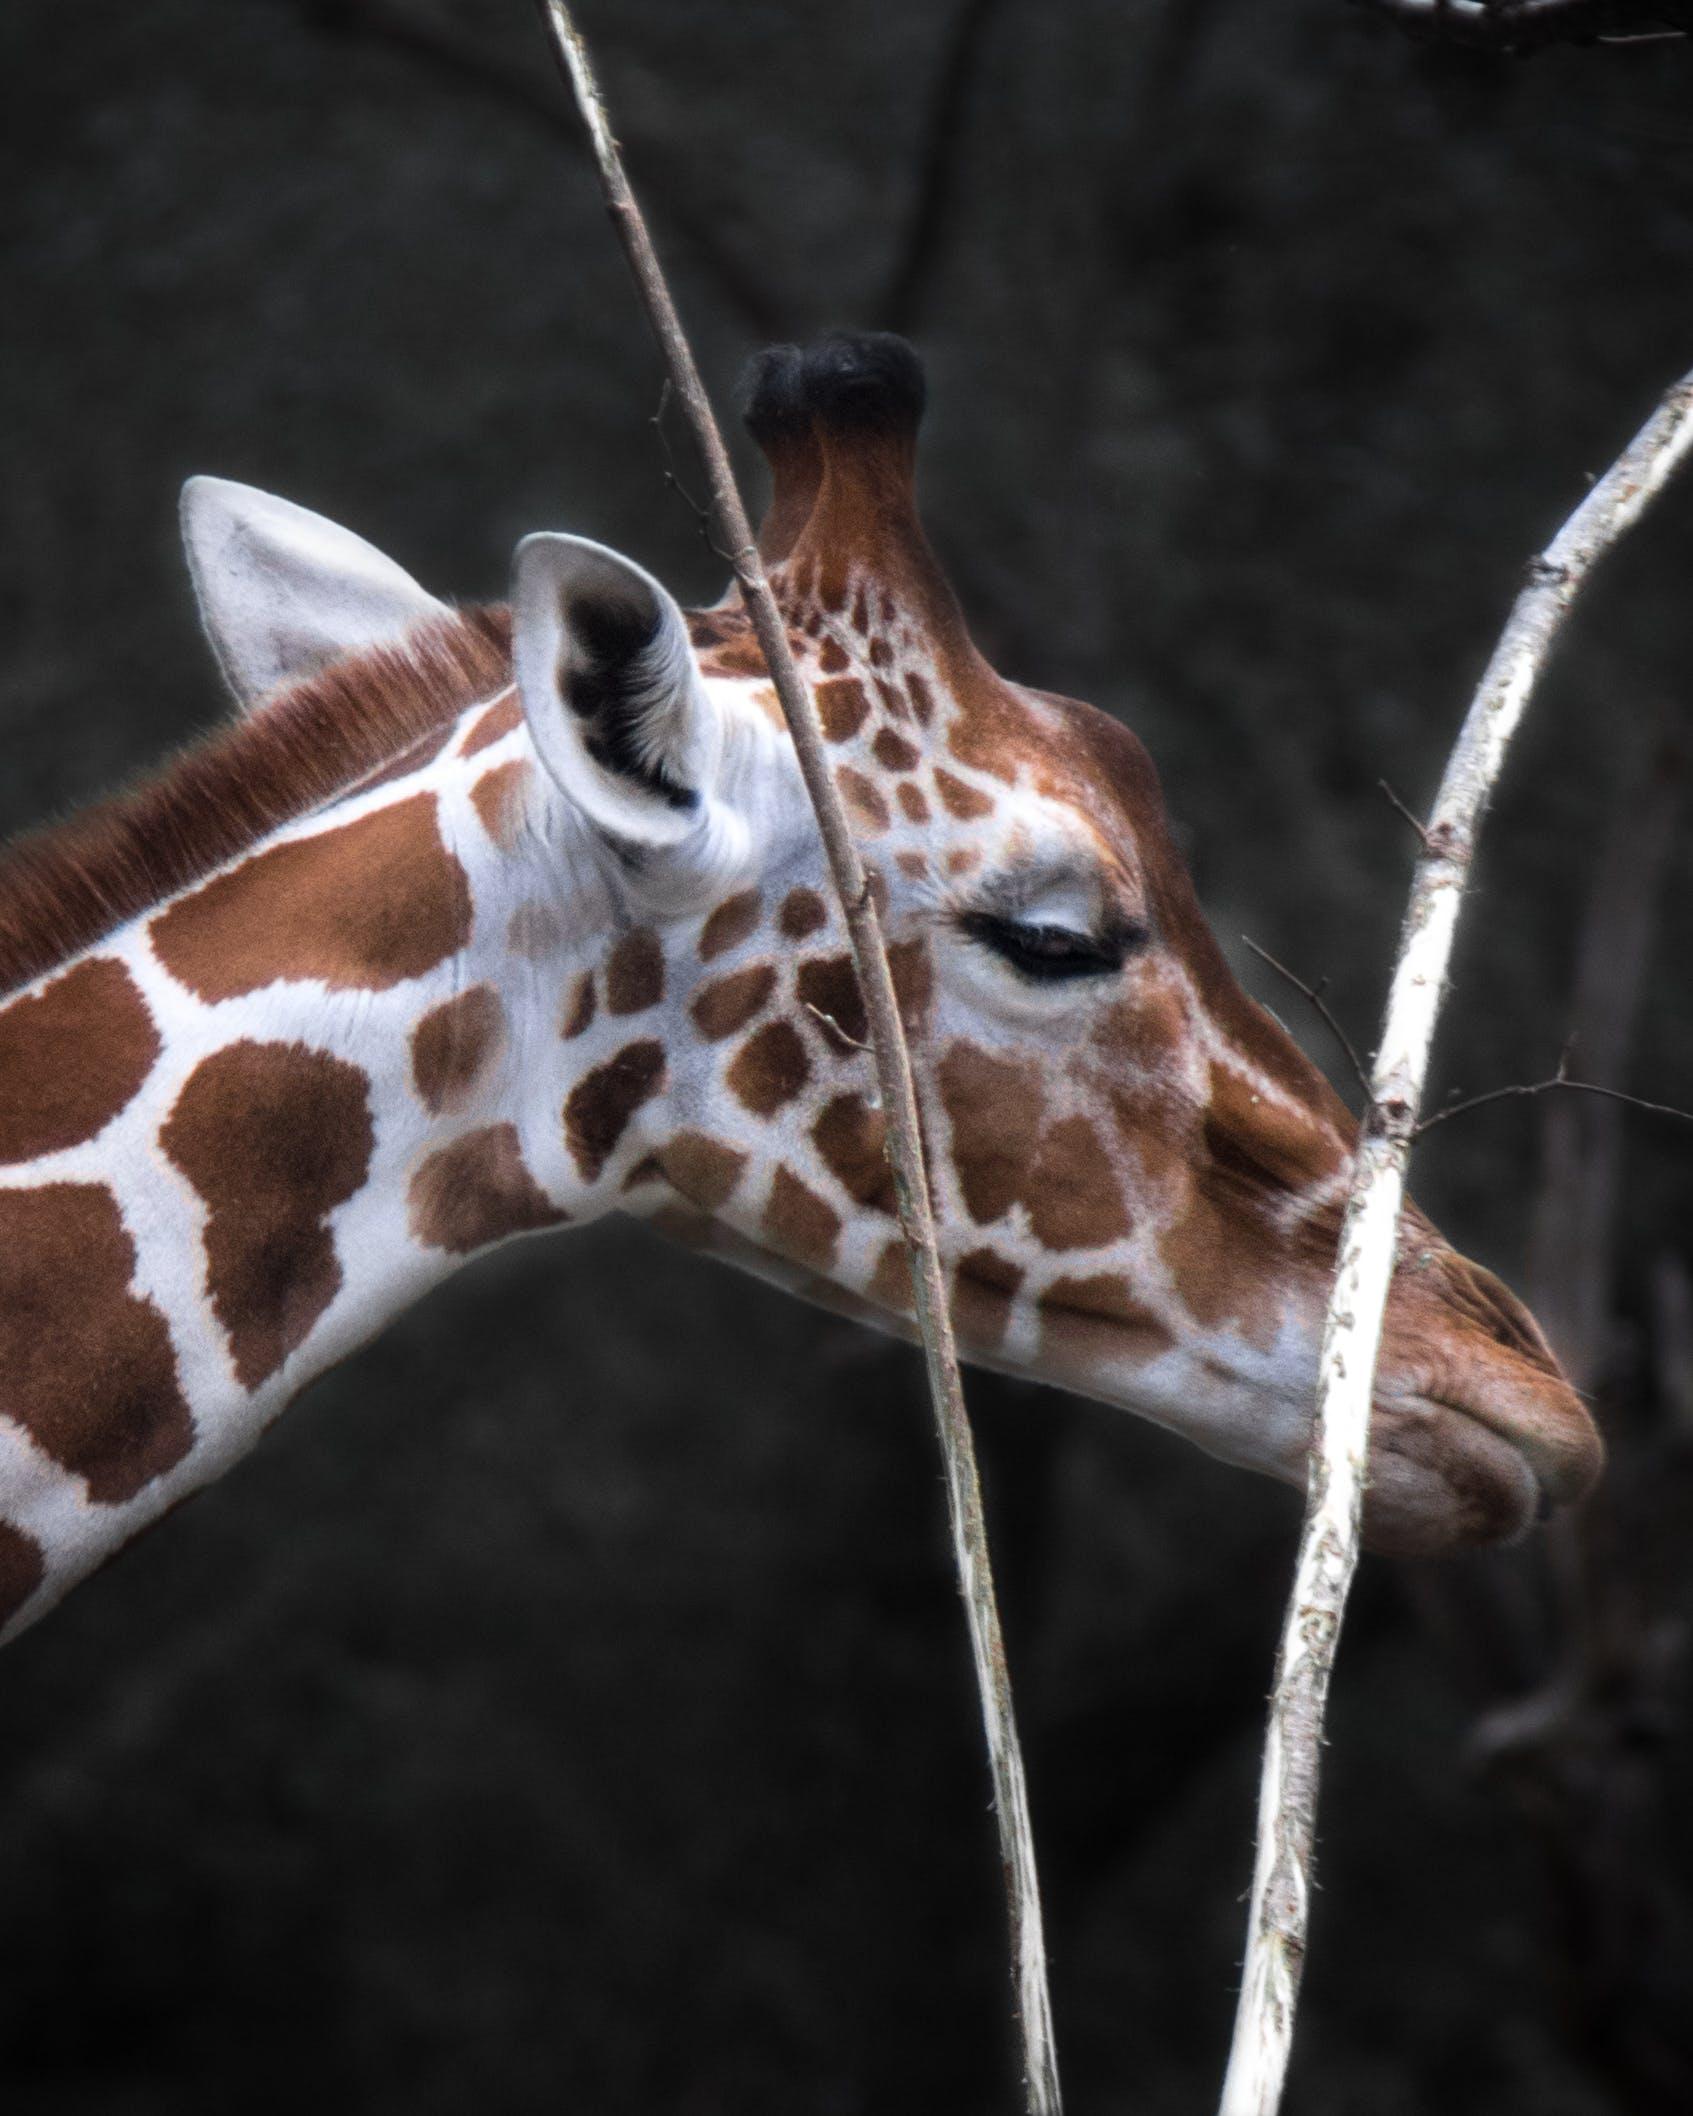 animal, animal photography, close-up